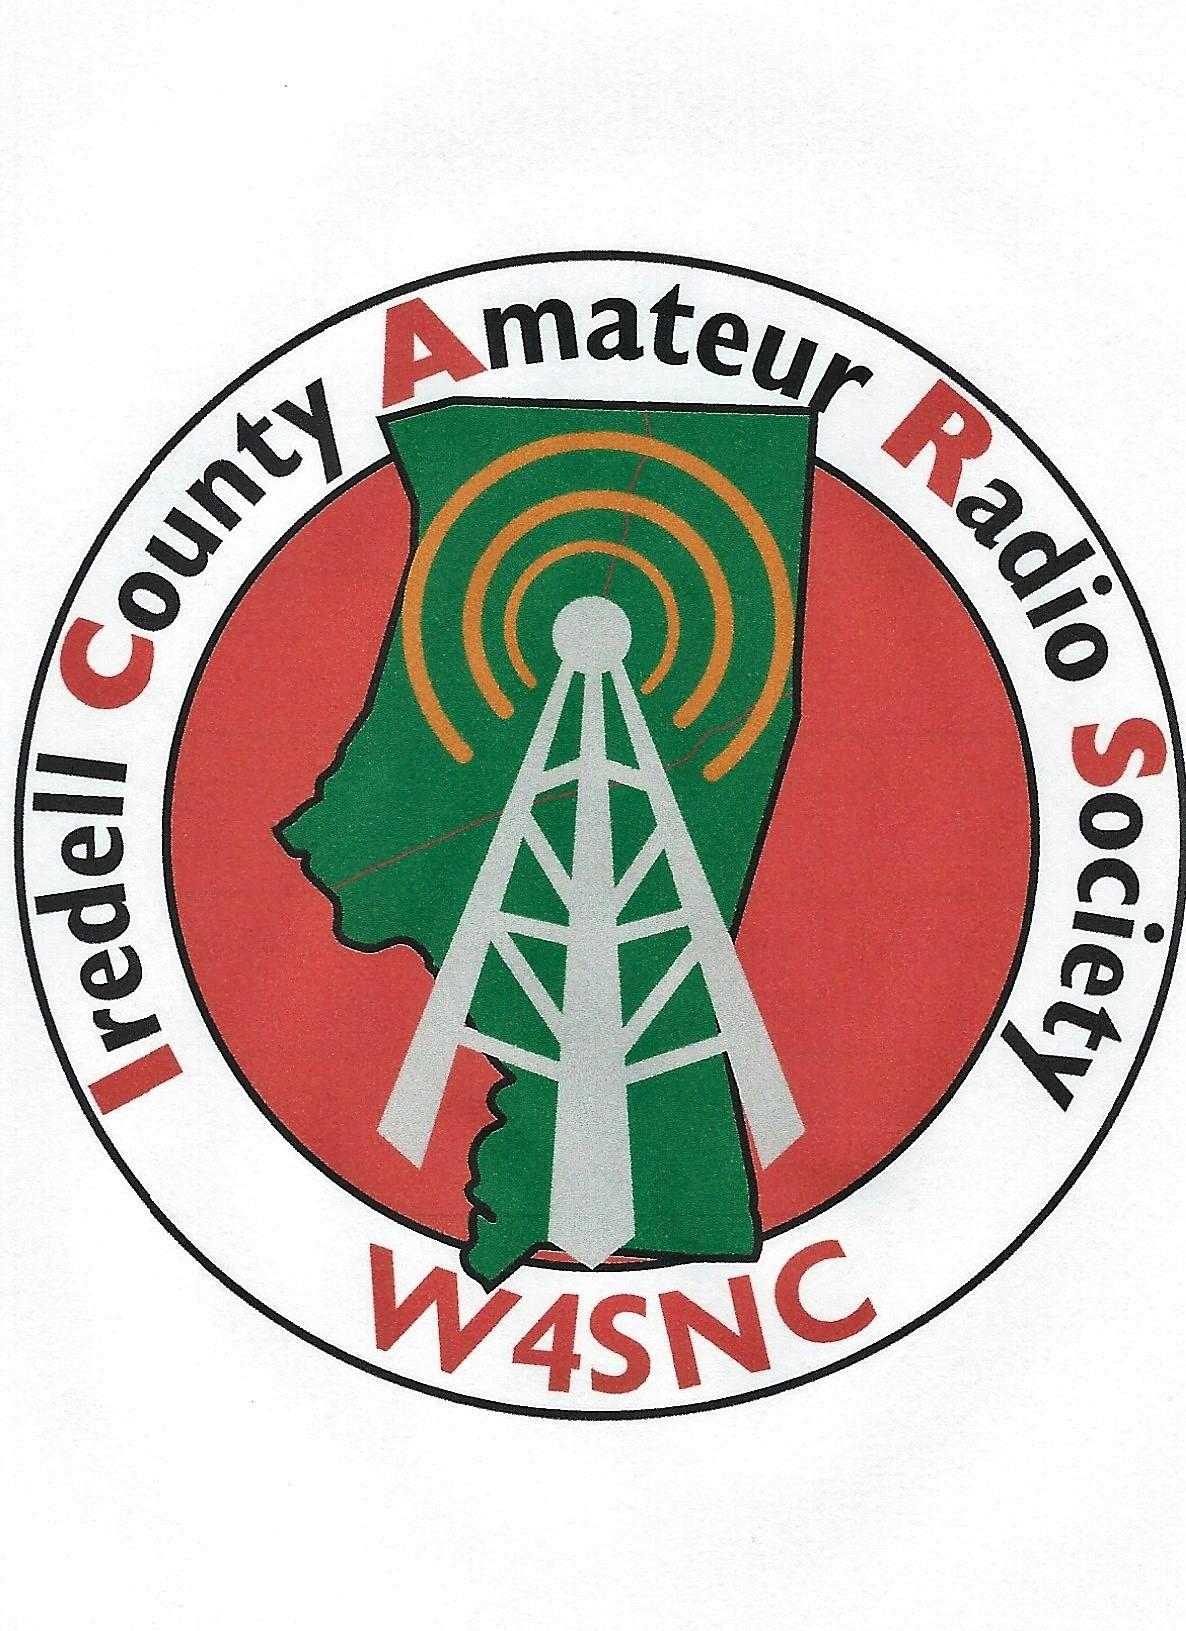 Bristol tn amateur radio club galleries 945